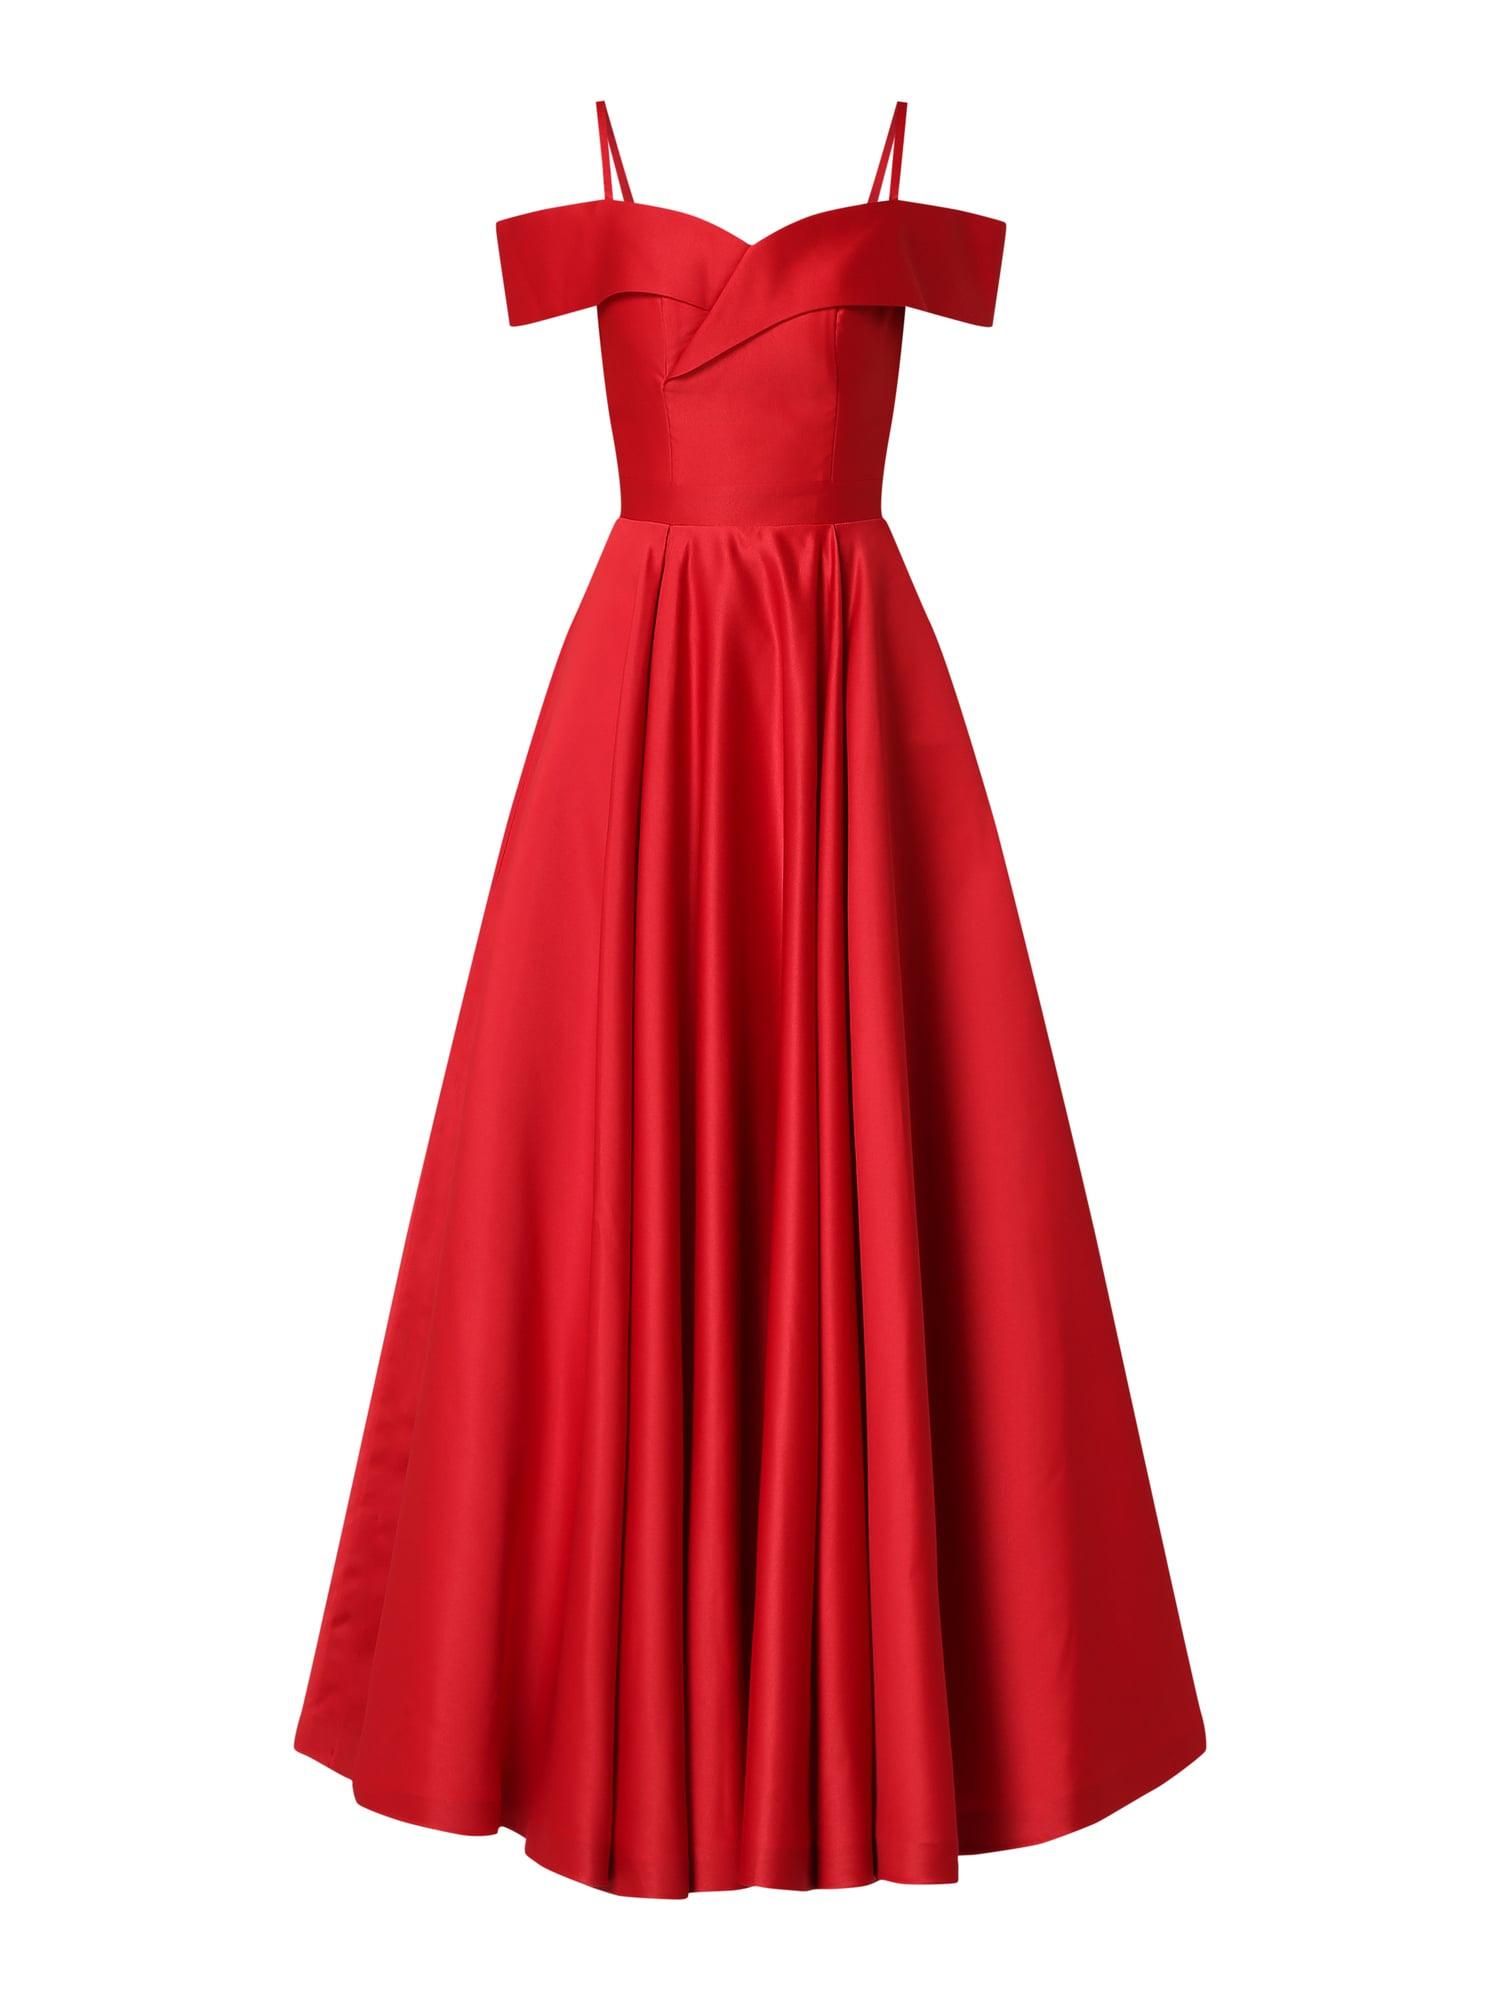 17 Einfach Abendkleid In Rot Bester Preis13 Großartig Abendkleid In Rot Galerie